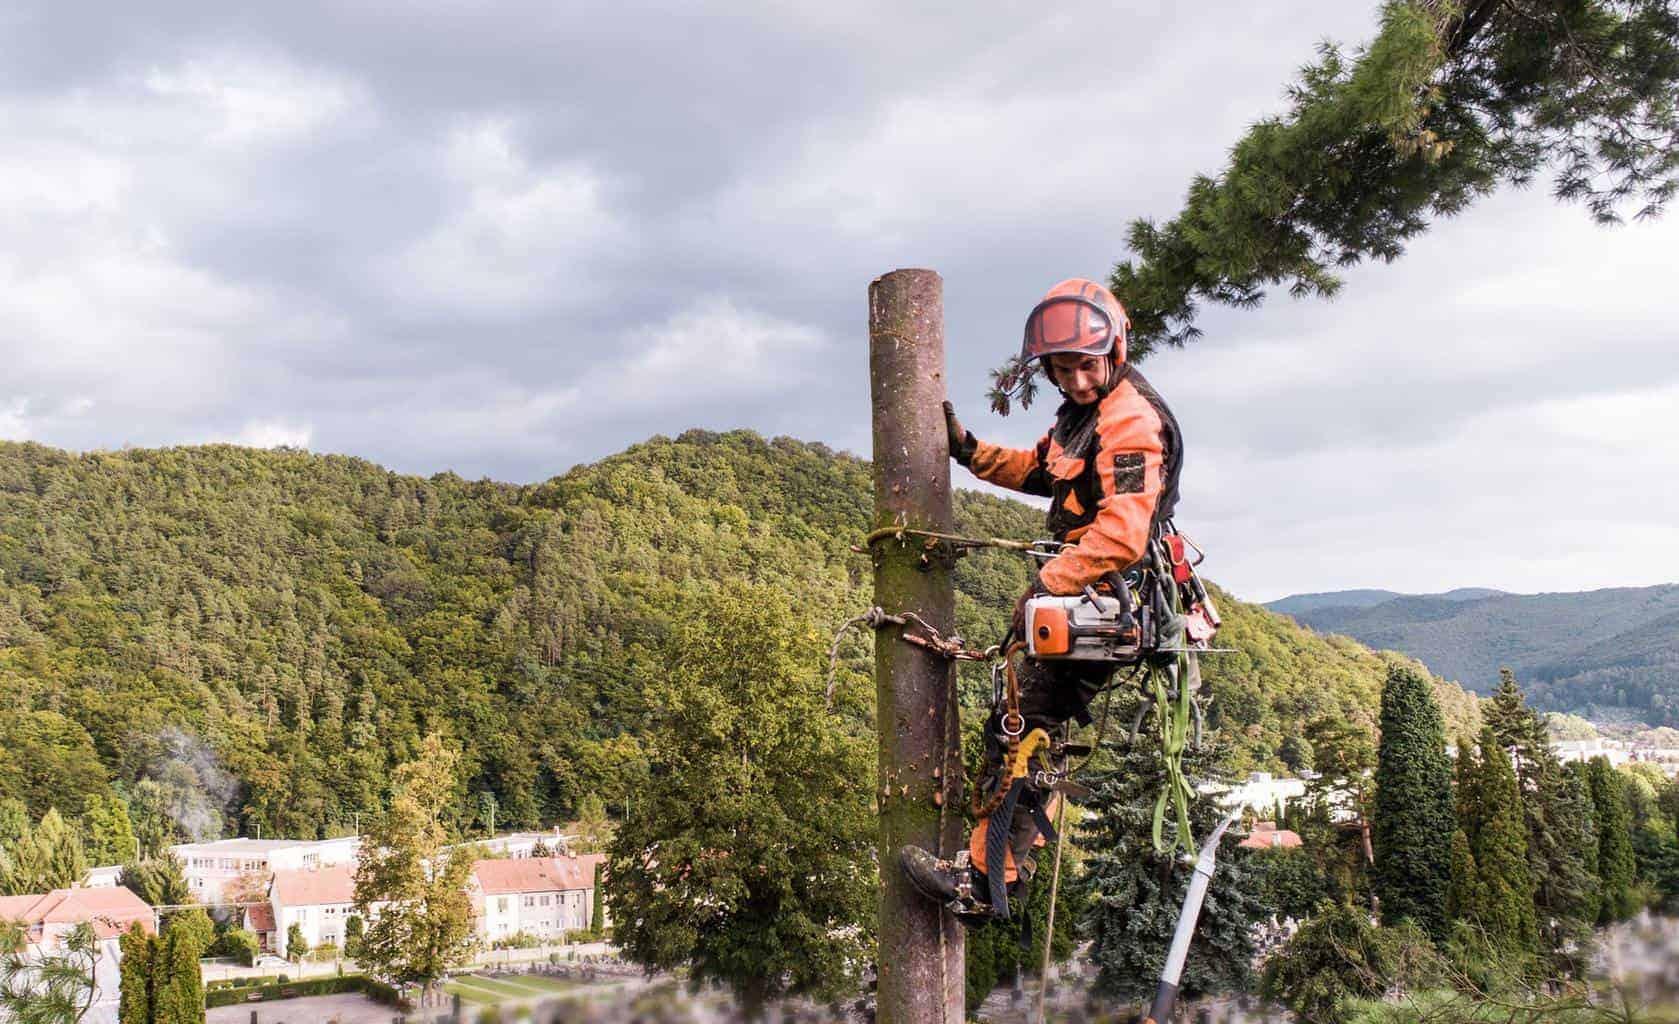 Arborist man with harness cutting a tree, climbing.